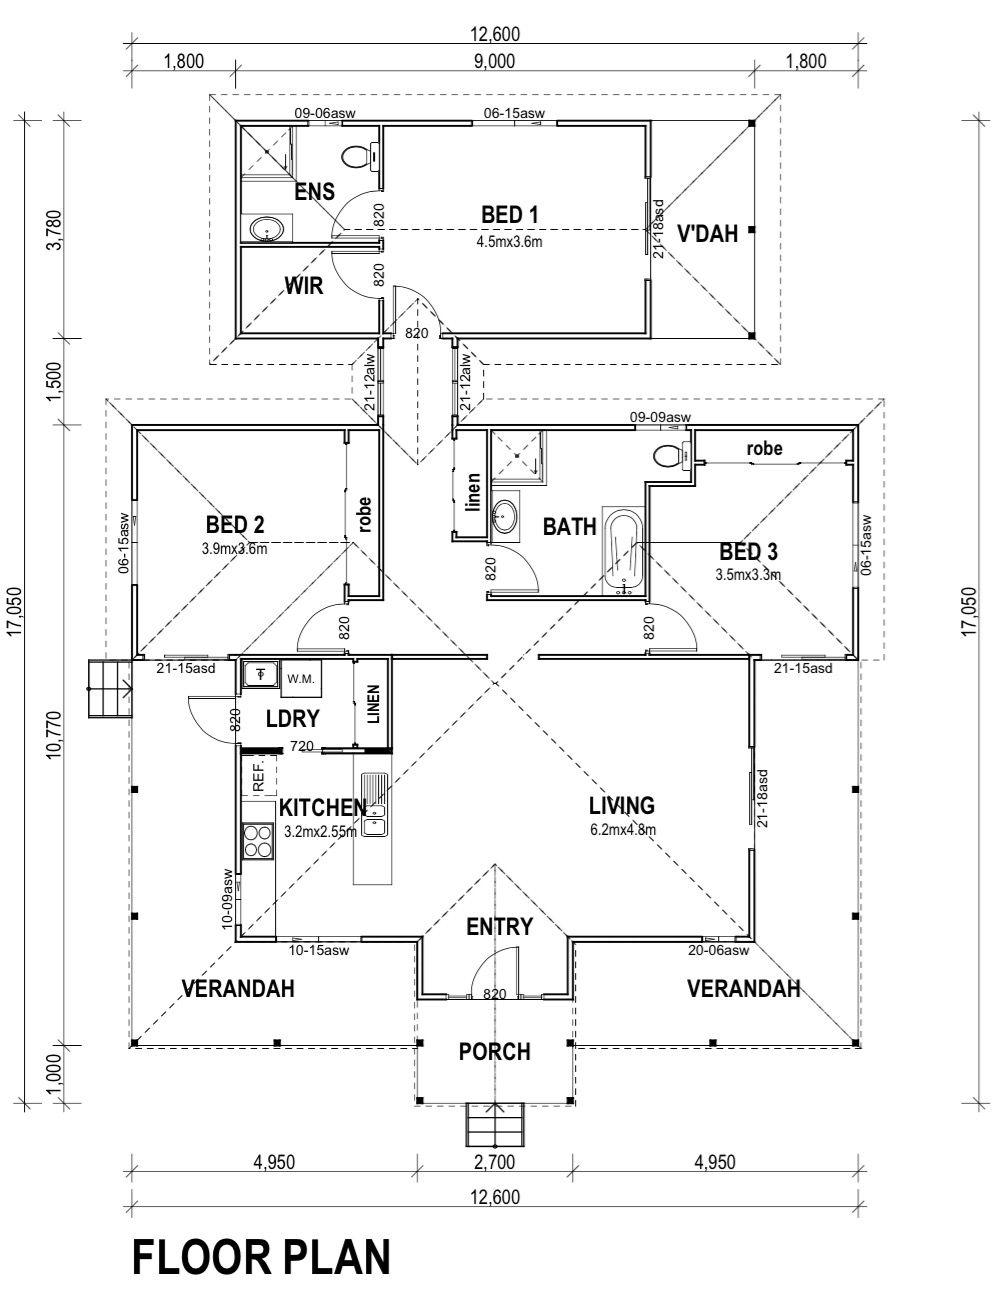 Luxury Designer Kit Homes Australia Component - Home Decorating ...